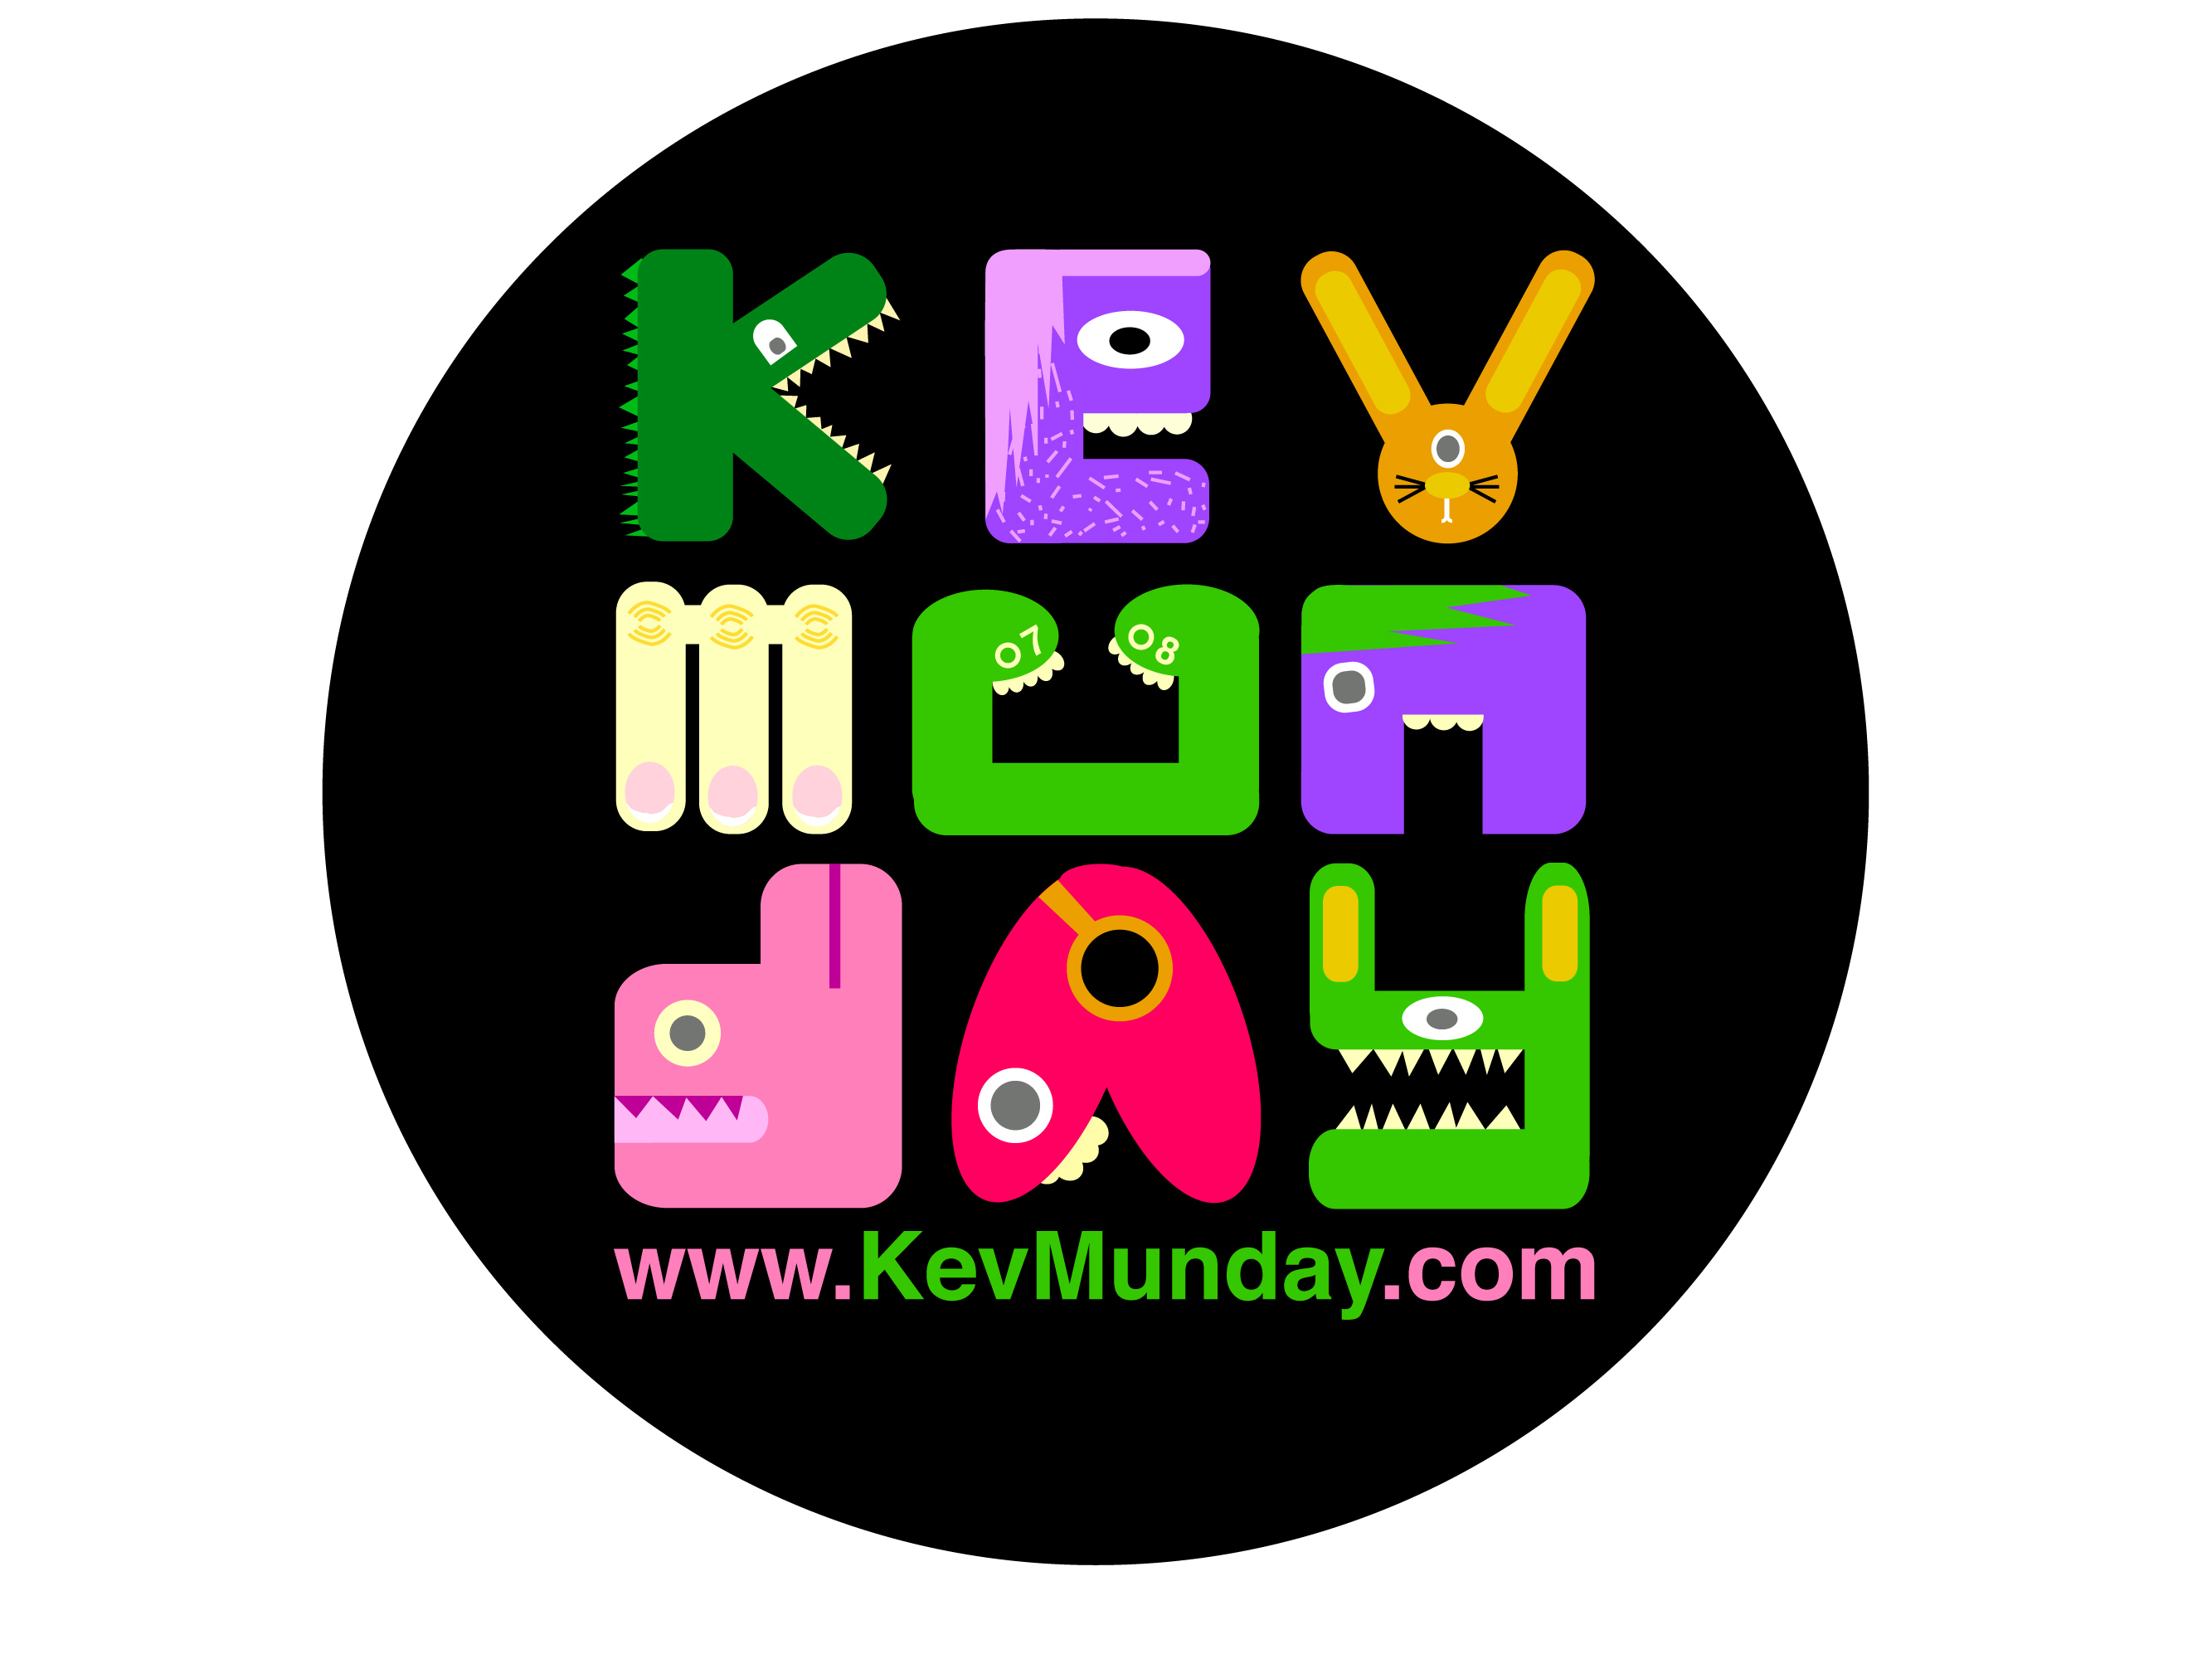 Kev logo  Portfolio by Kev Munday at Coroflot.com